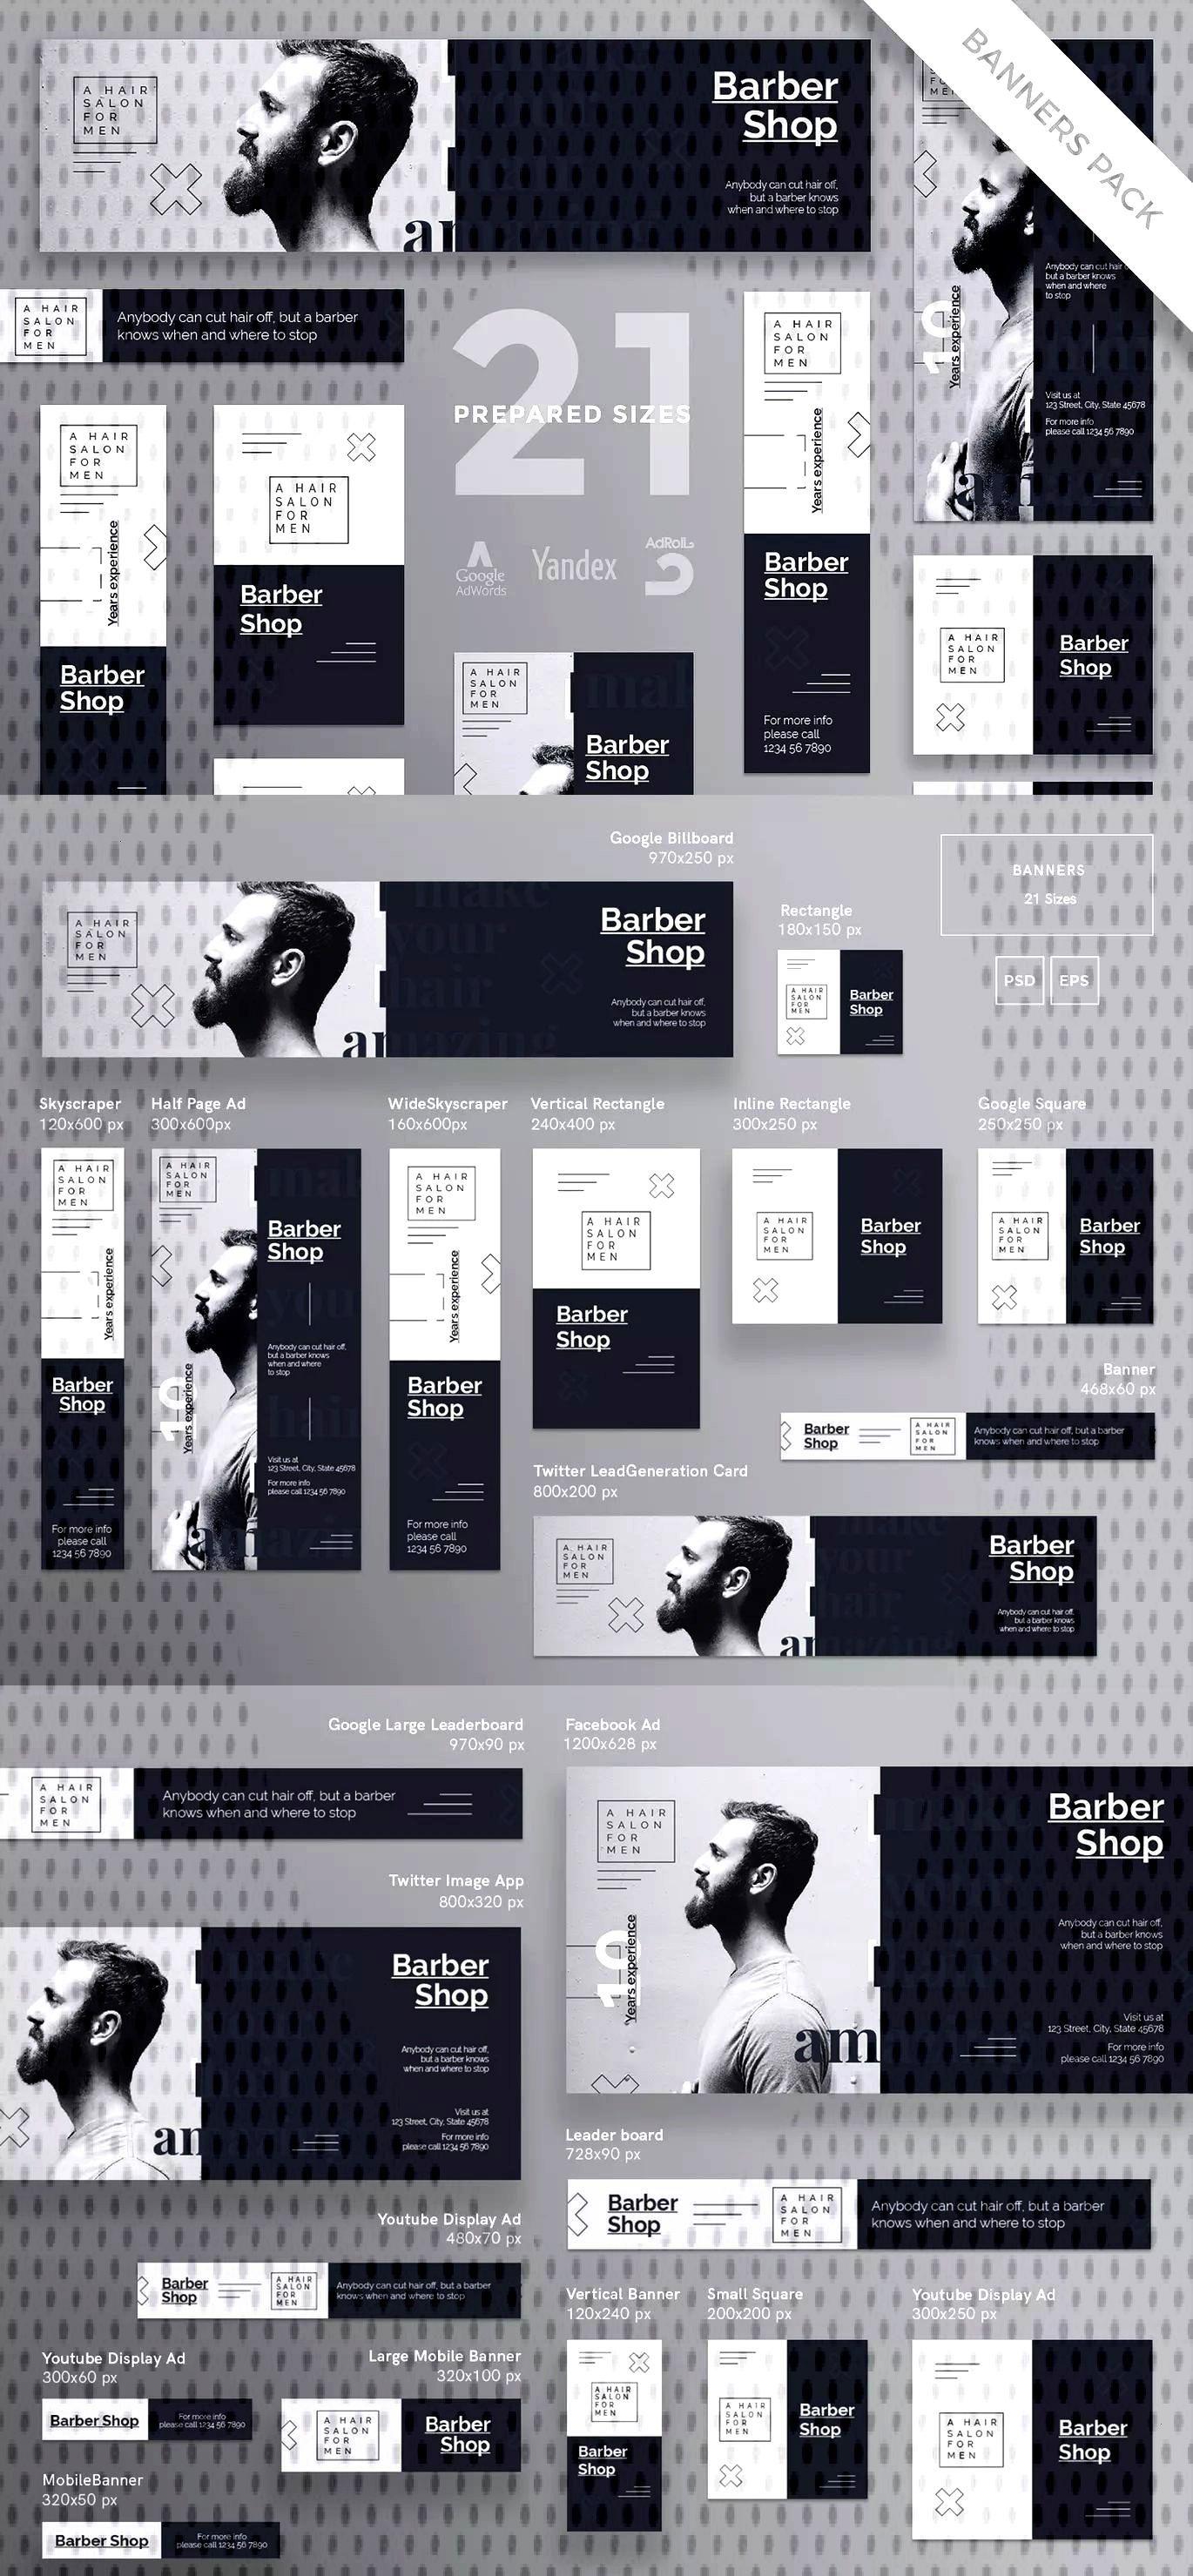 Barbershop Template Haircut Banner Pack Eps Psd Barbershop Haircut Banner Pack Template Ep Diseno Banner Diseno De Sitios Web Diseno Grafico De Catalogo